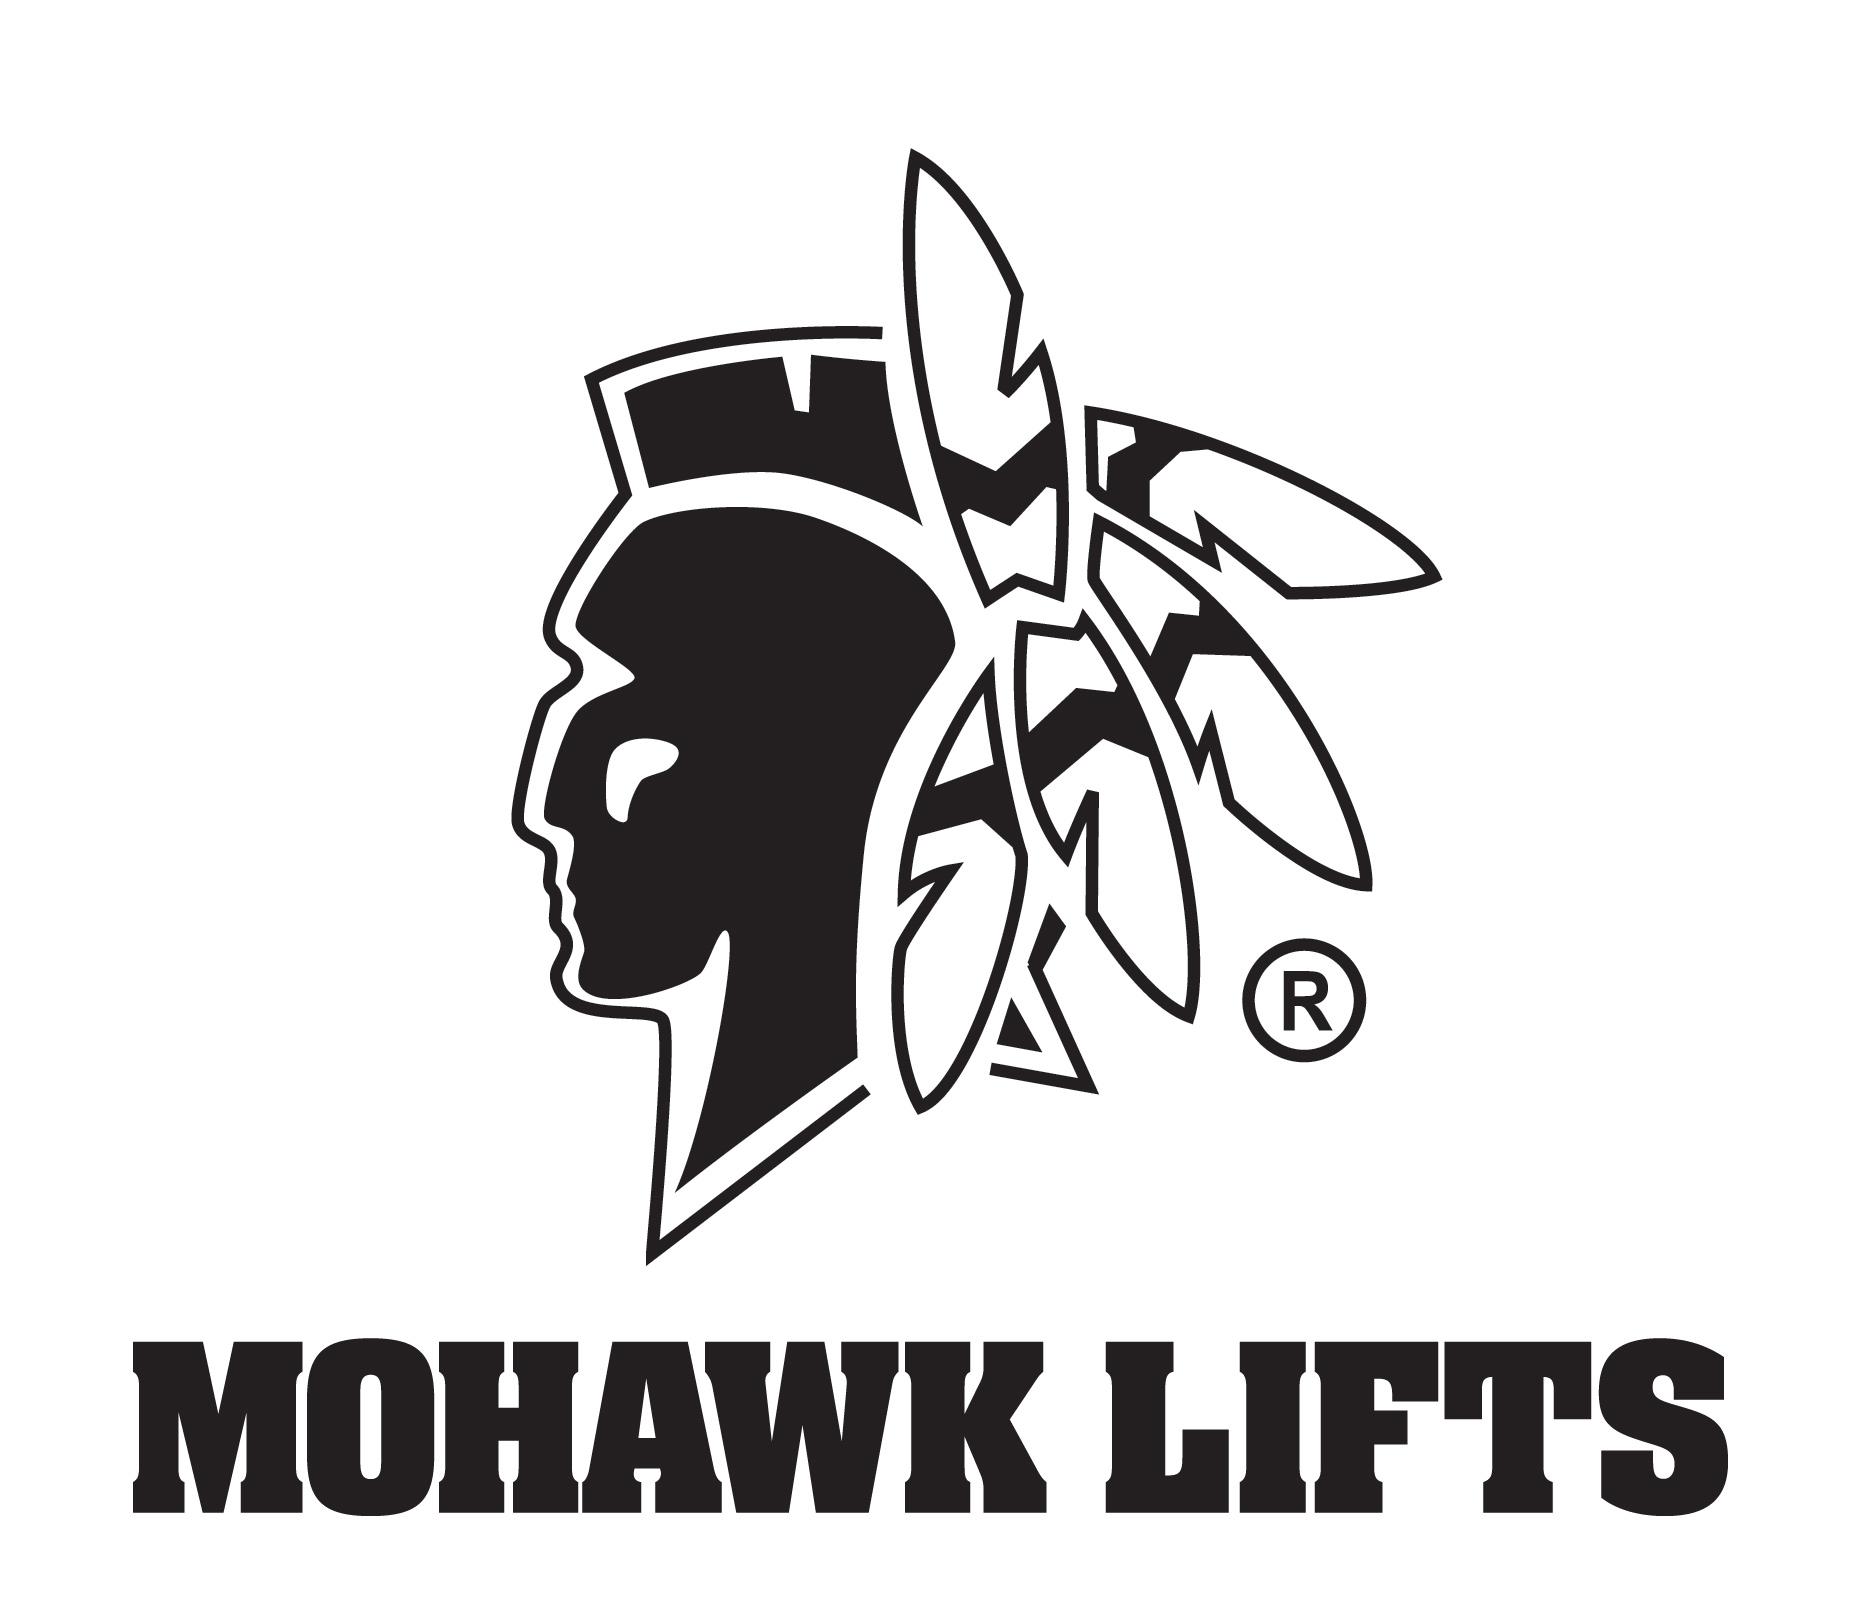 mohawk lifts logos